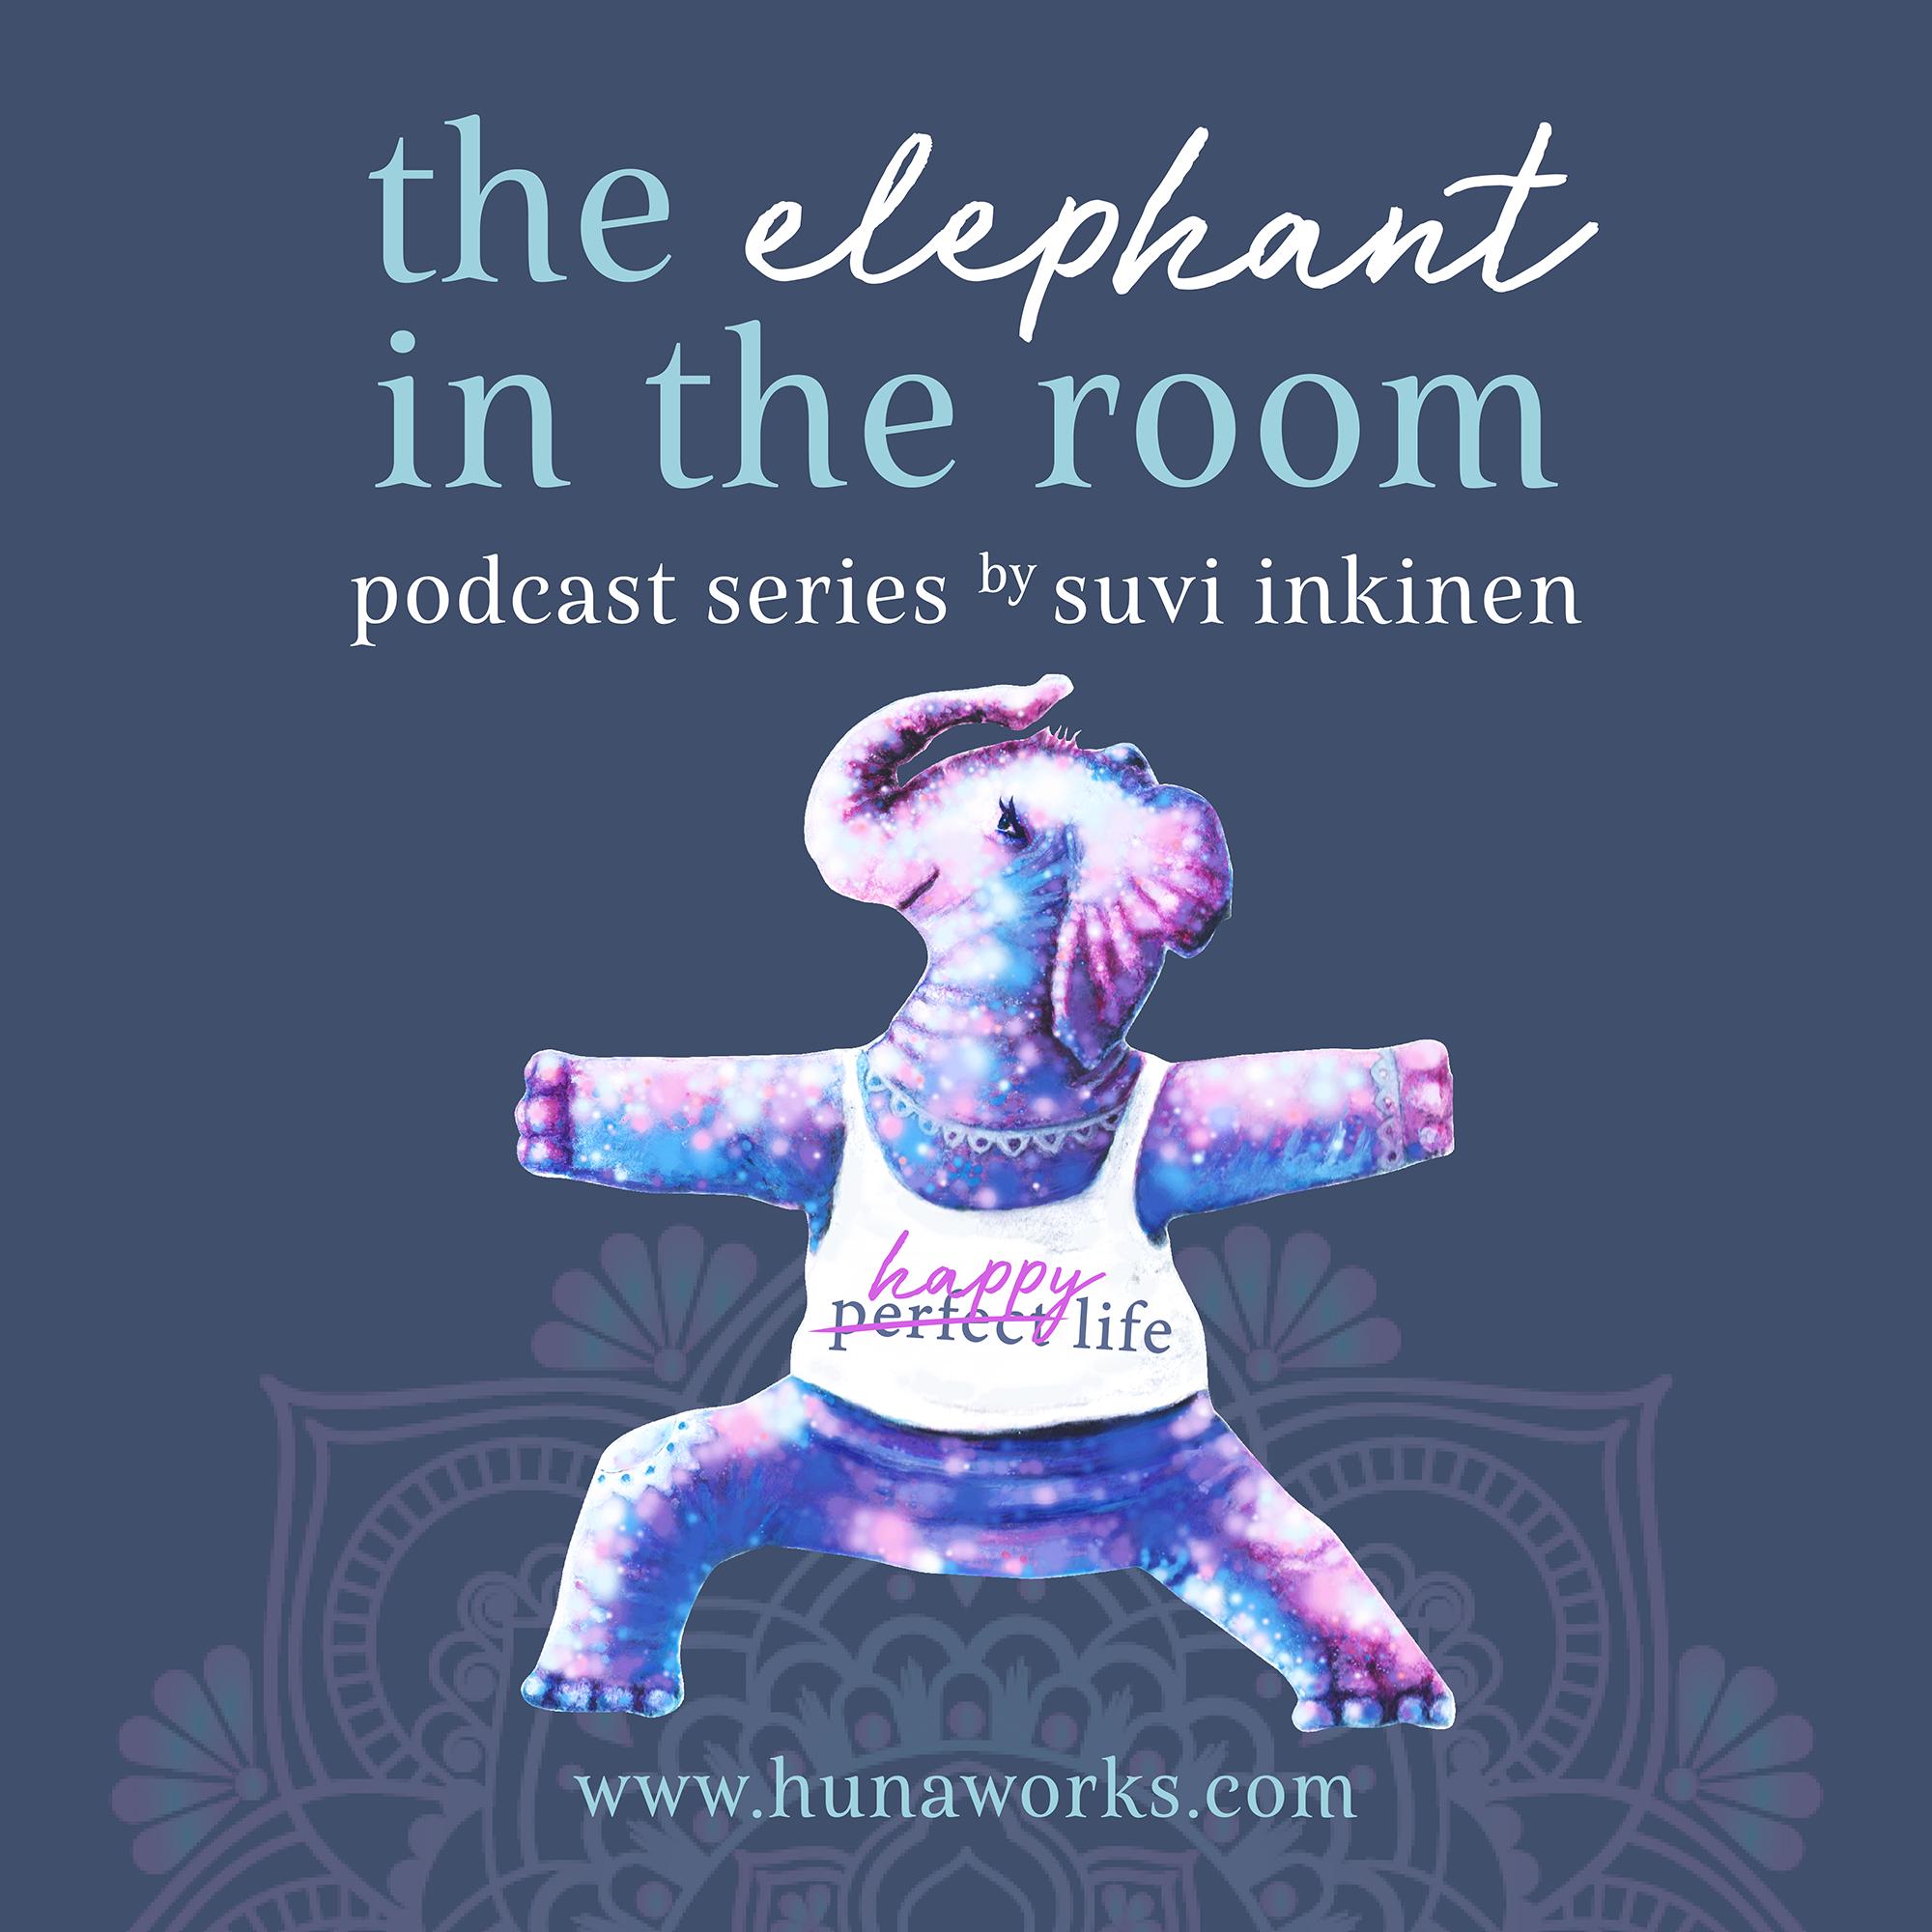 Episode 4 - With Cassey Maynard, aka.The Energiser show art